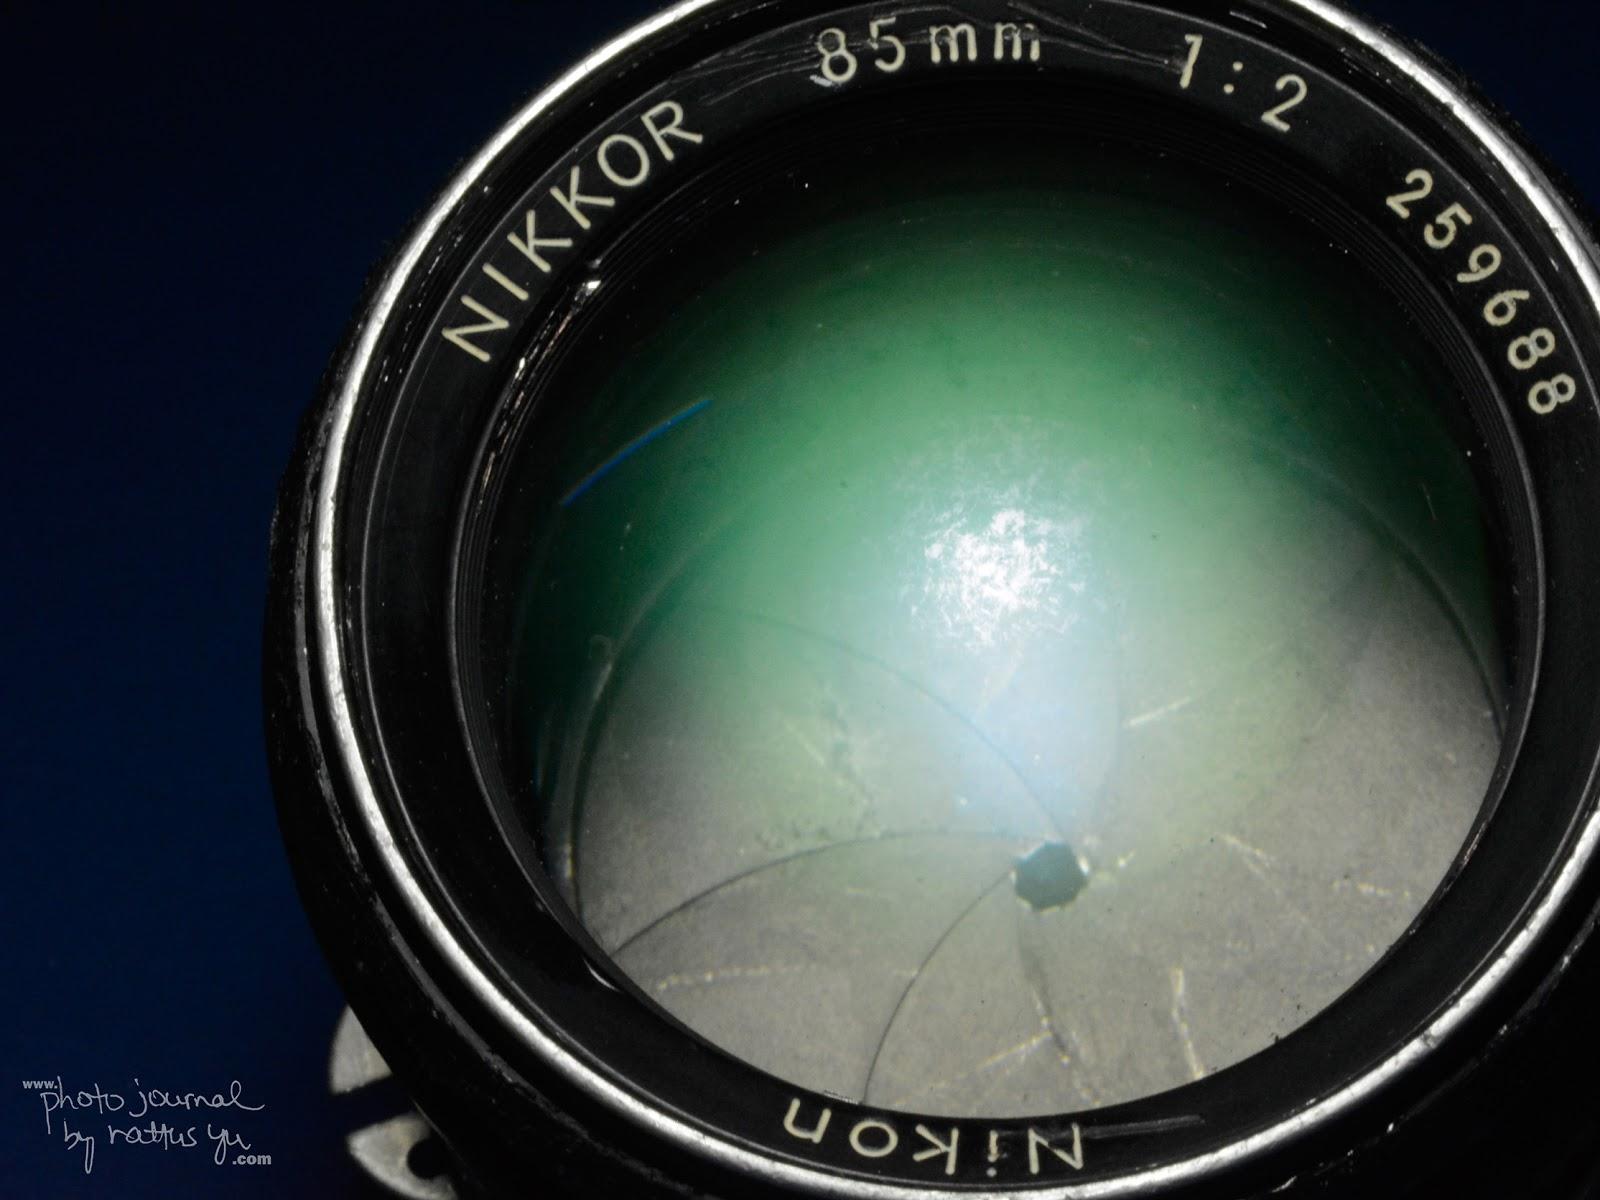 Nikkor 85mm f/2 AI